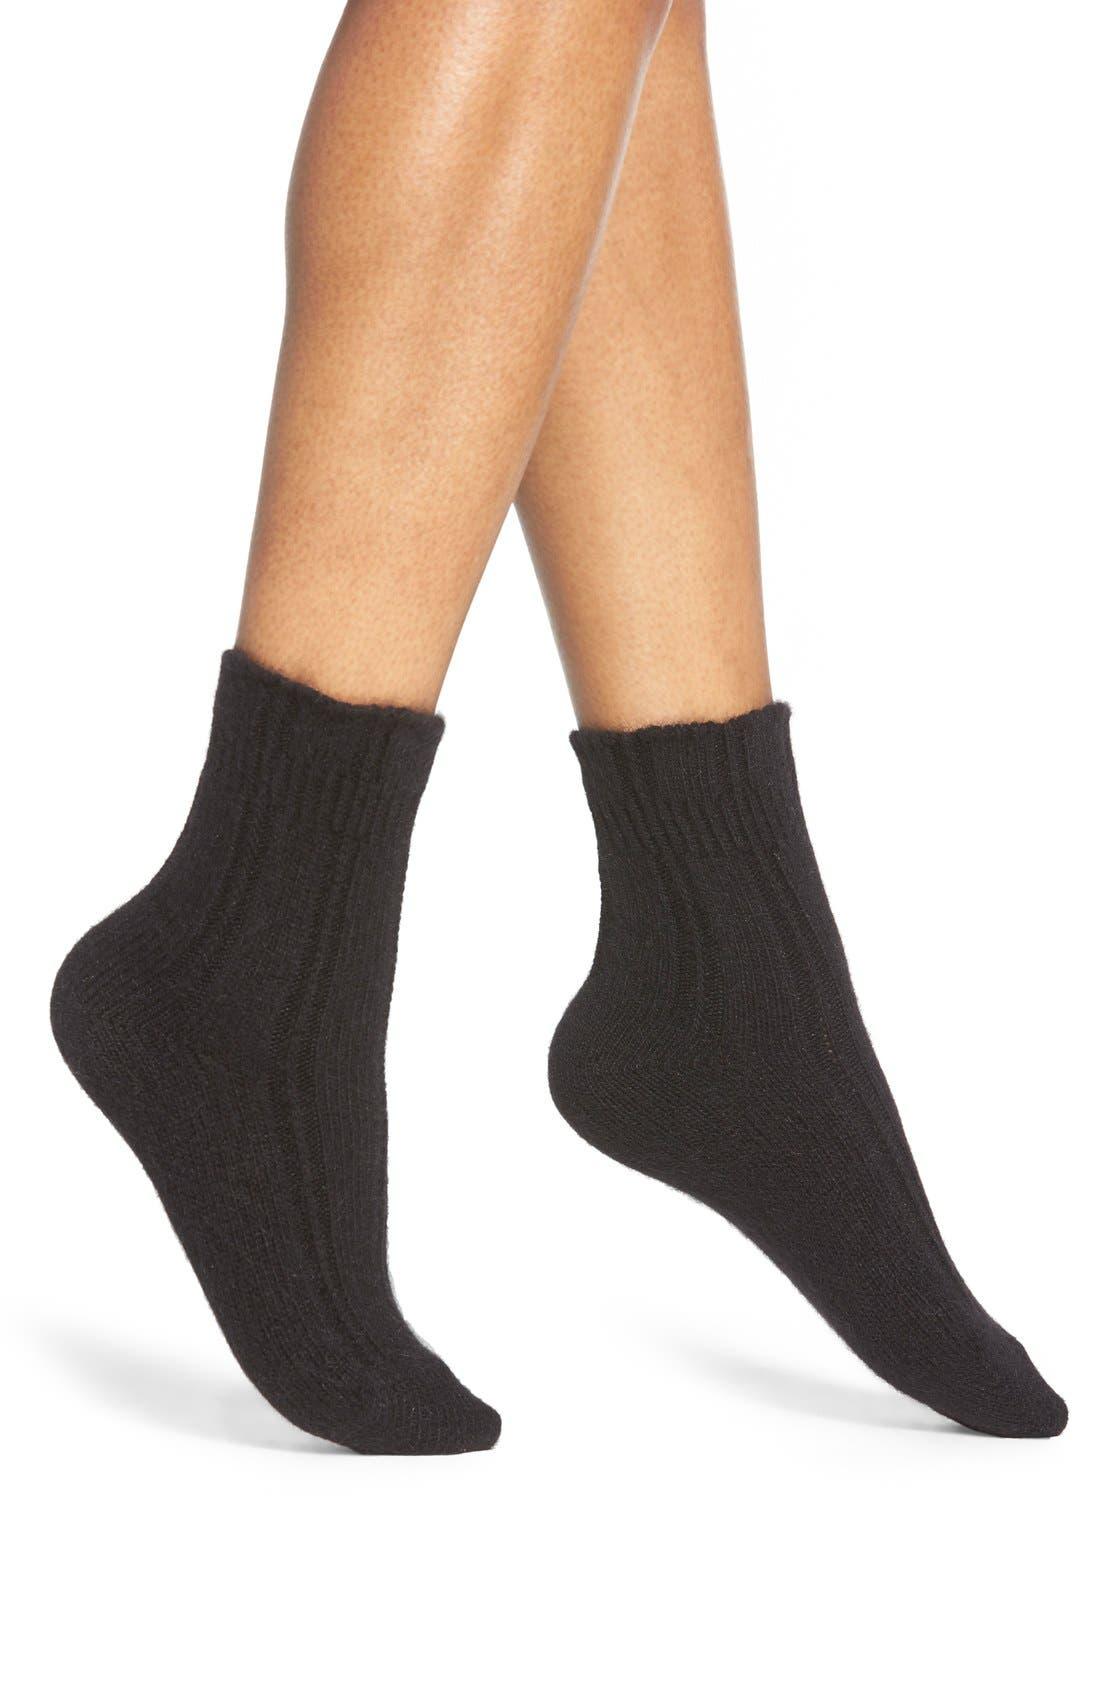 FALKE Knit Bed Socks, Main, color, 008